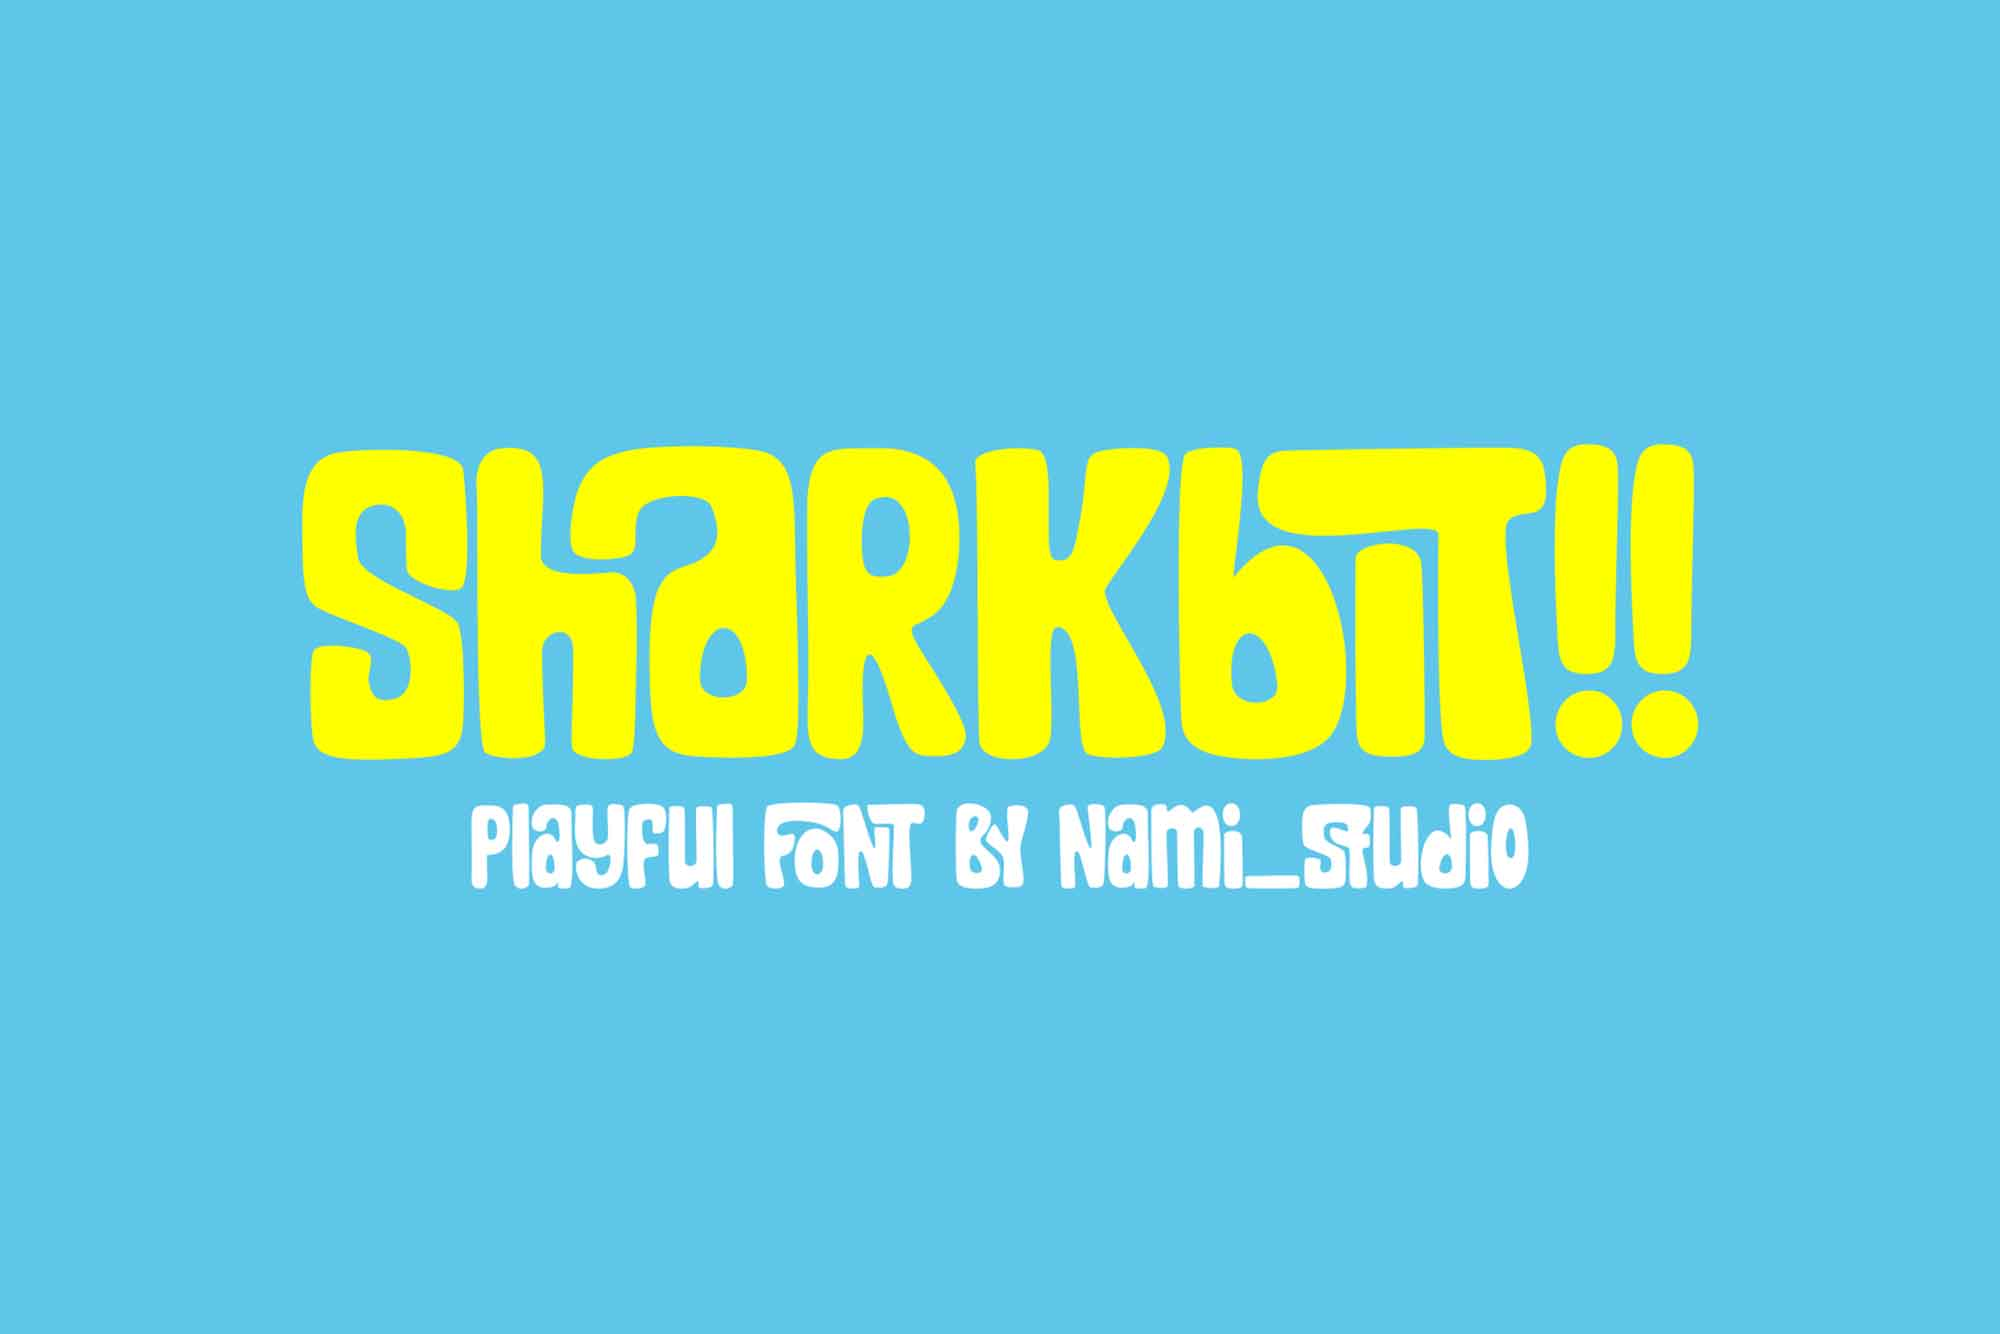 Sharkbit Display Font